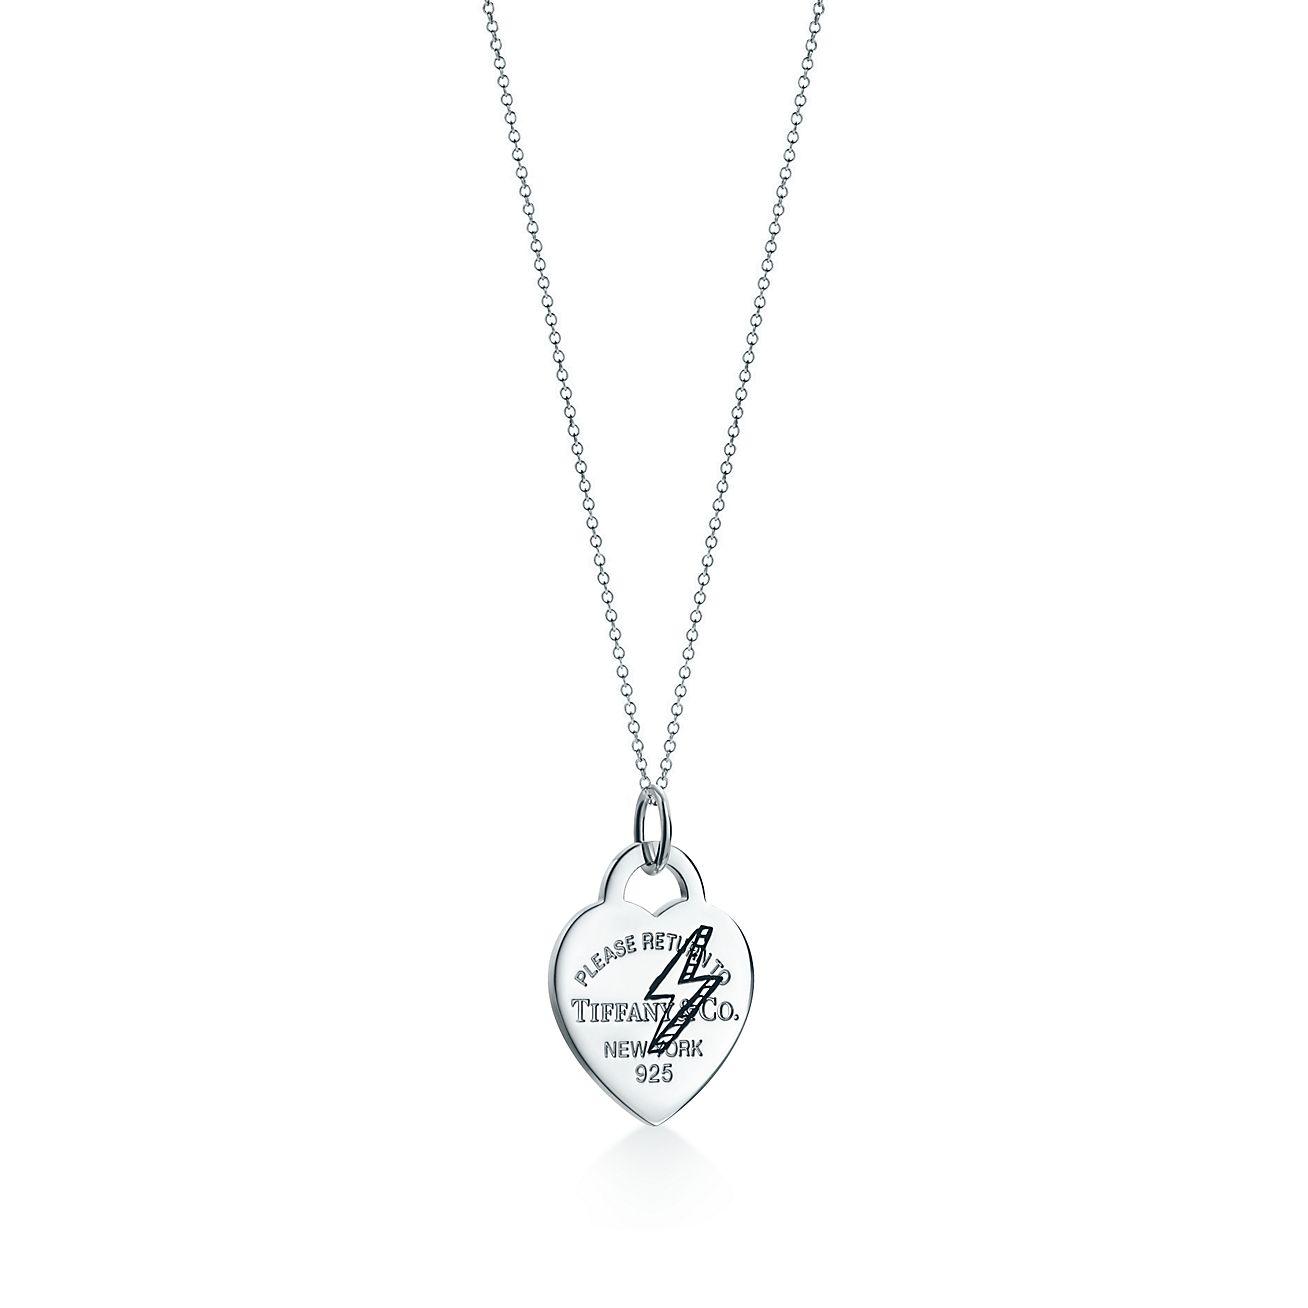 Lightning Jewellery,bracelet Lightning Bolt Charm Lightning Gift Lightning Bracelet Lightning Bolt Lightning Jewelry Initial bracelet